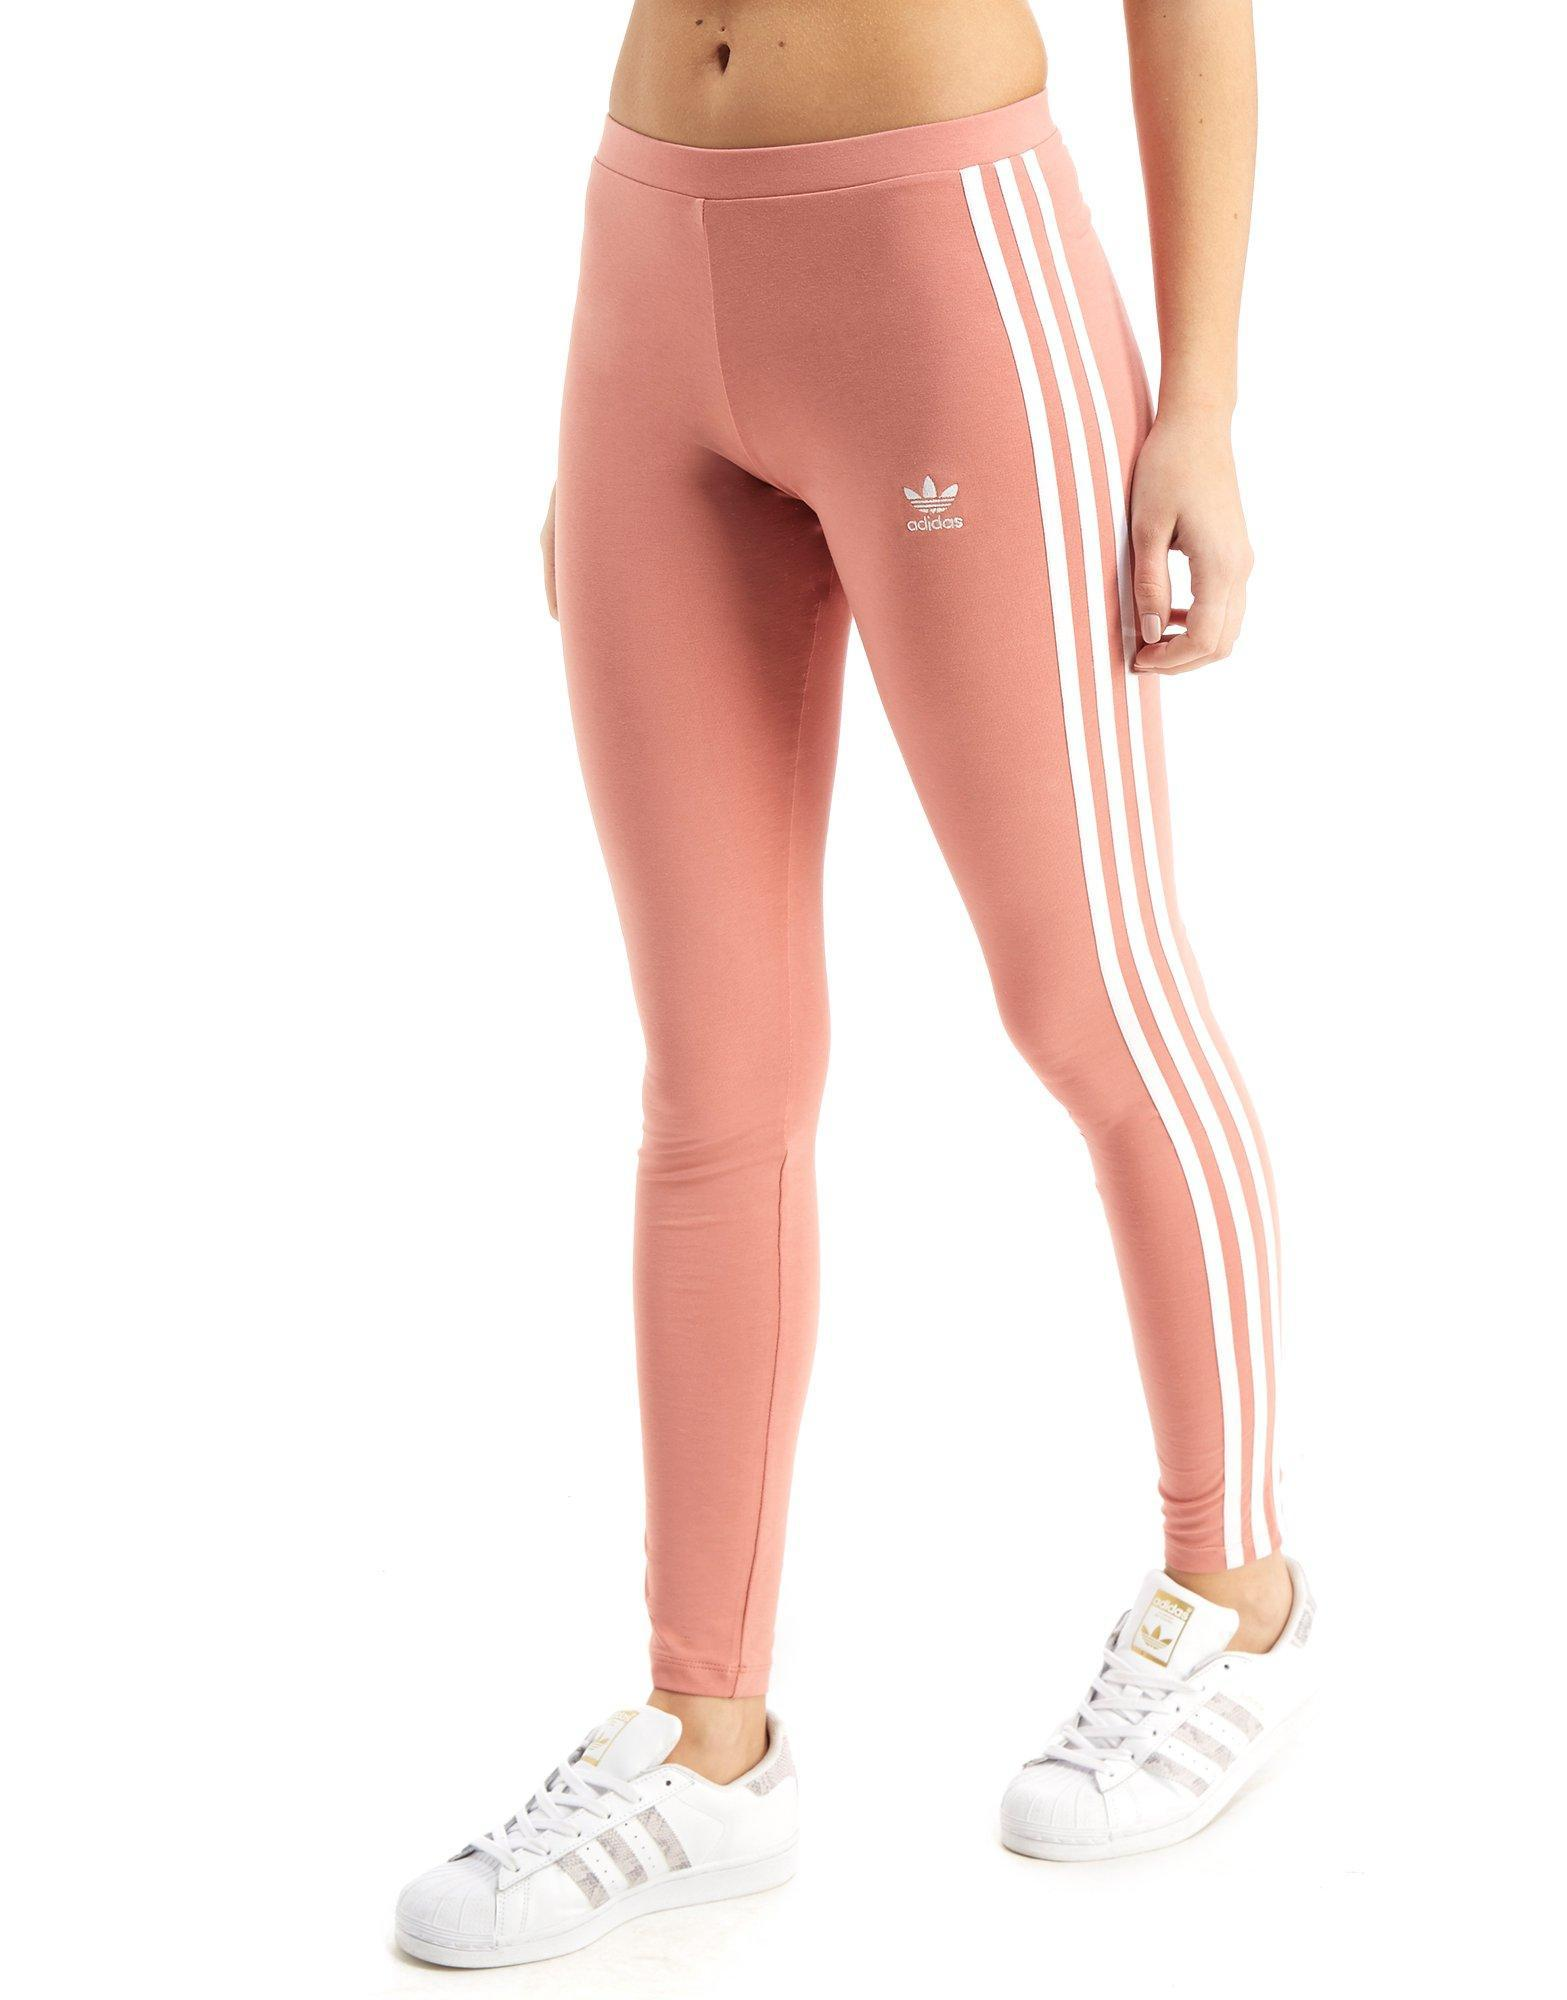 58152d8ec3371 adidas Originals 3-stripes Leggings in Pink - Lyst